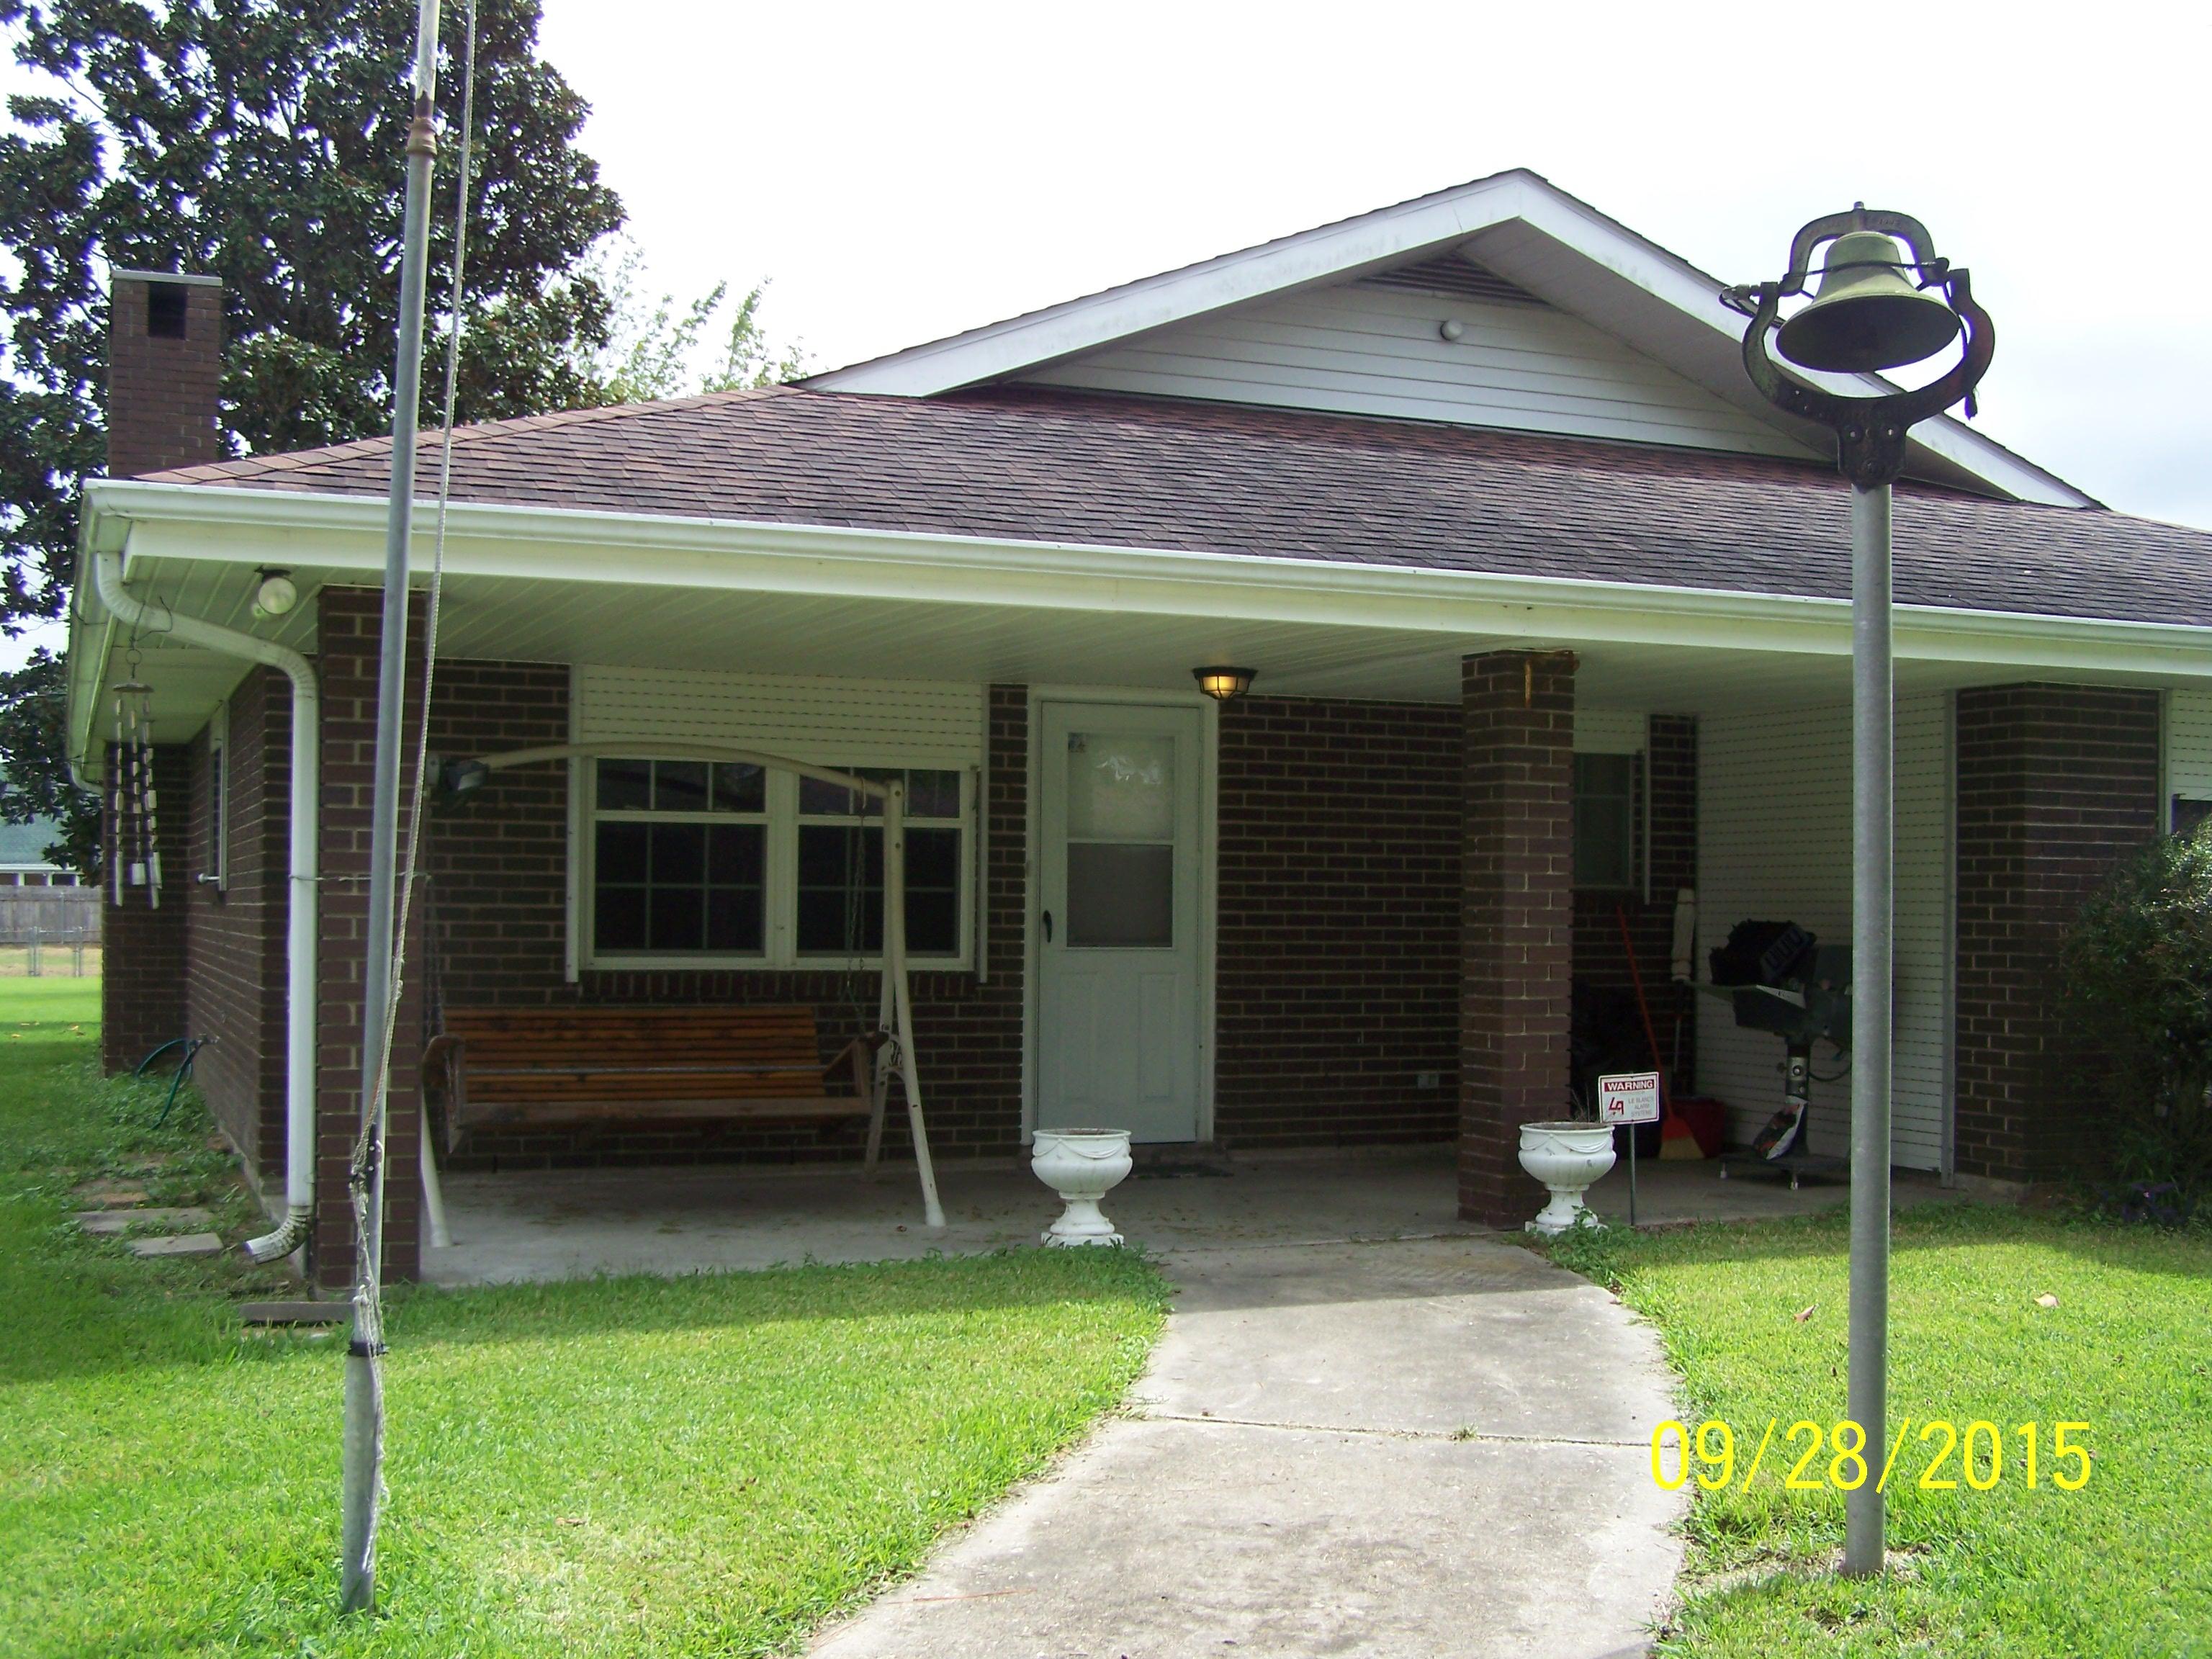 3891 LAFITTE LAROSE HWY, Marrero, Louisiana 70072